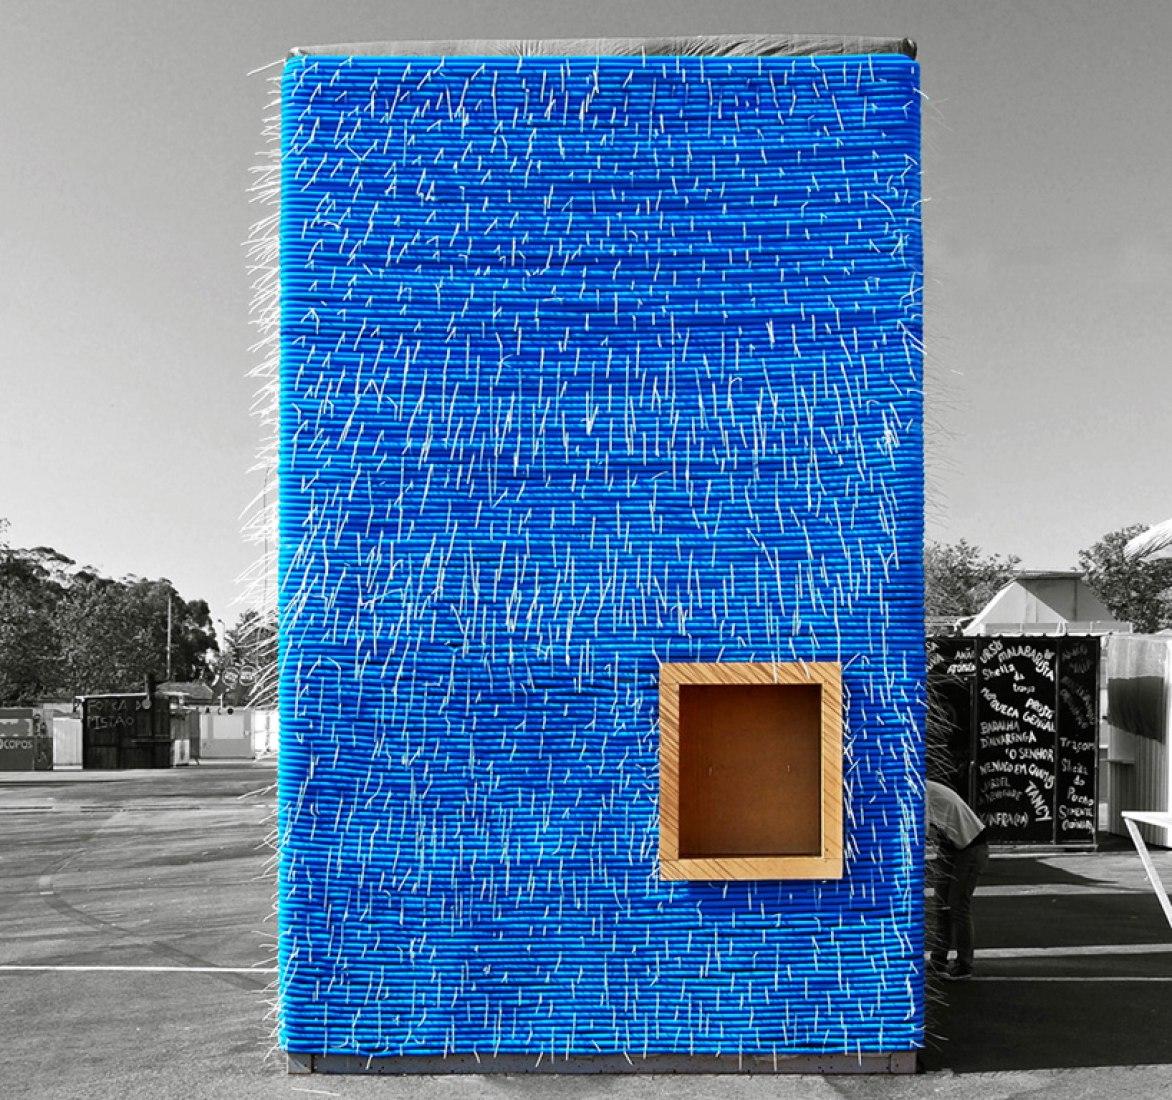 Bluetube Bar by DOSE. Photography © Carlos Trancoso / Dose